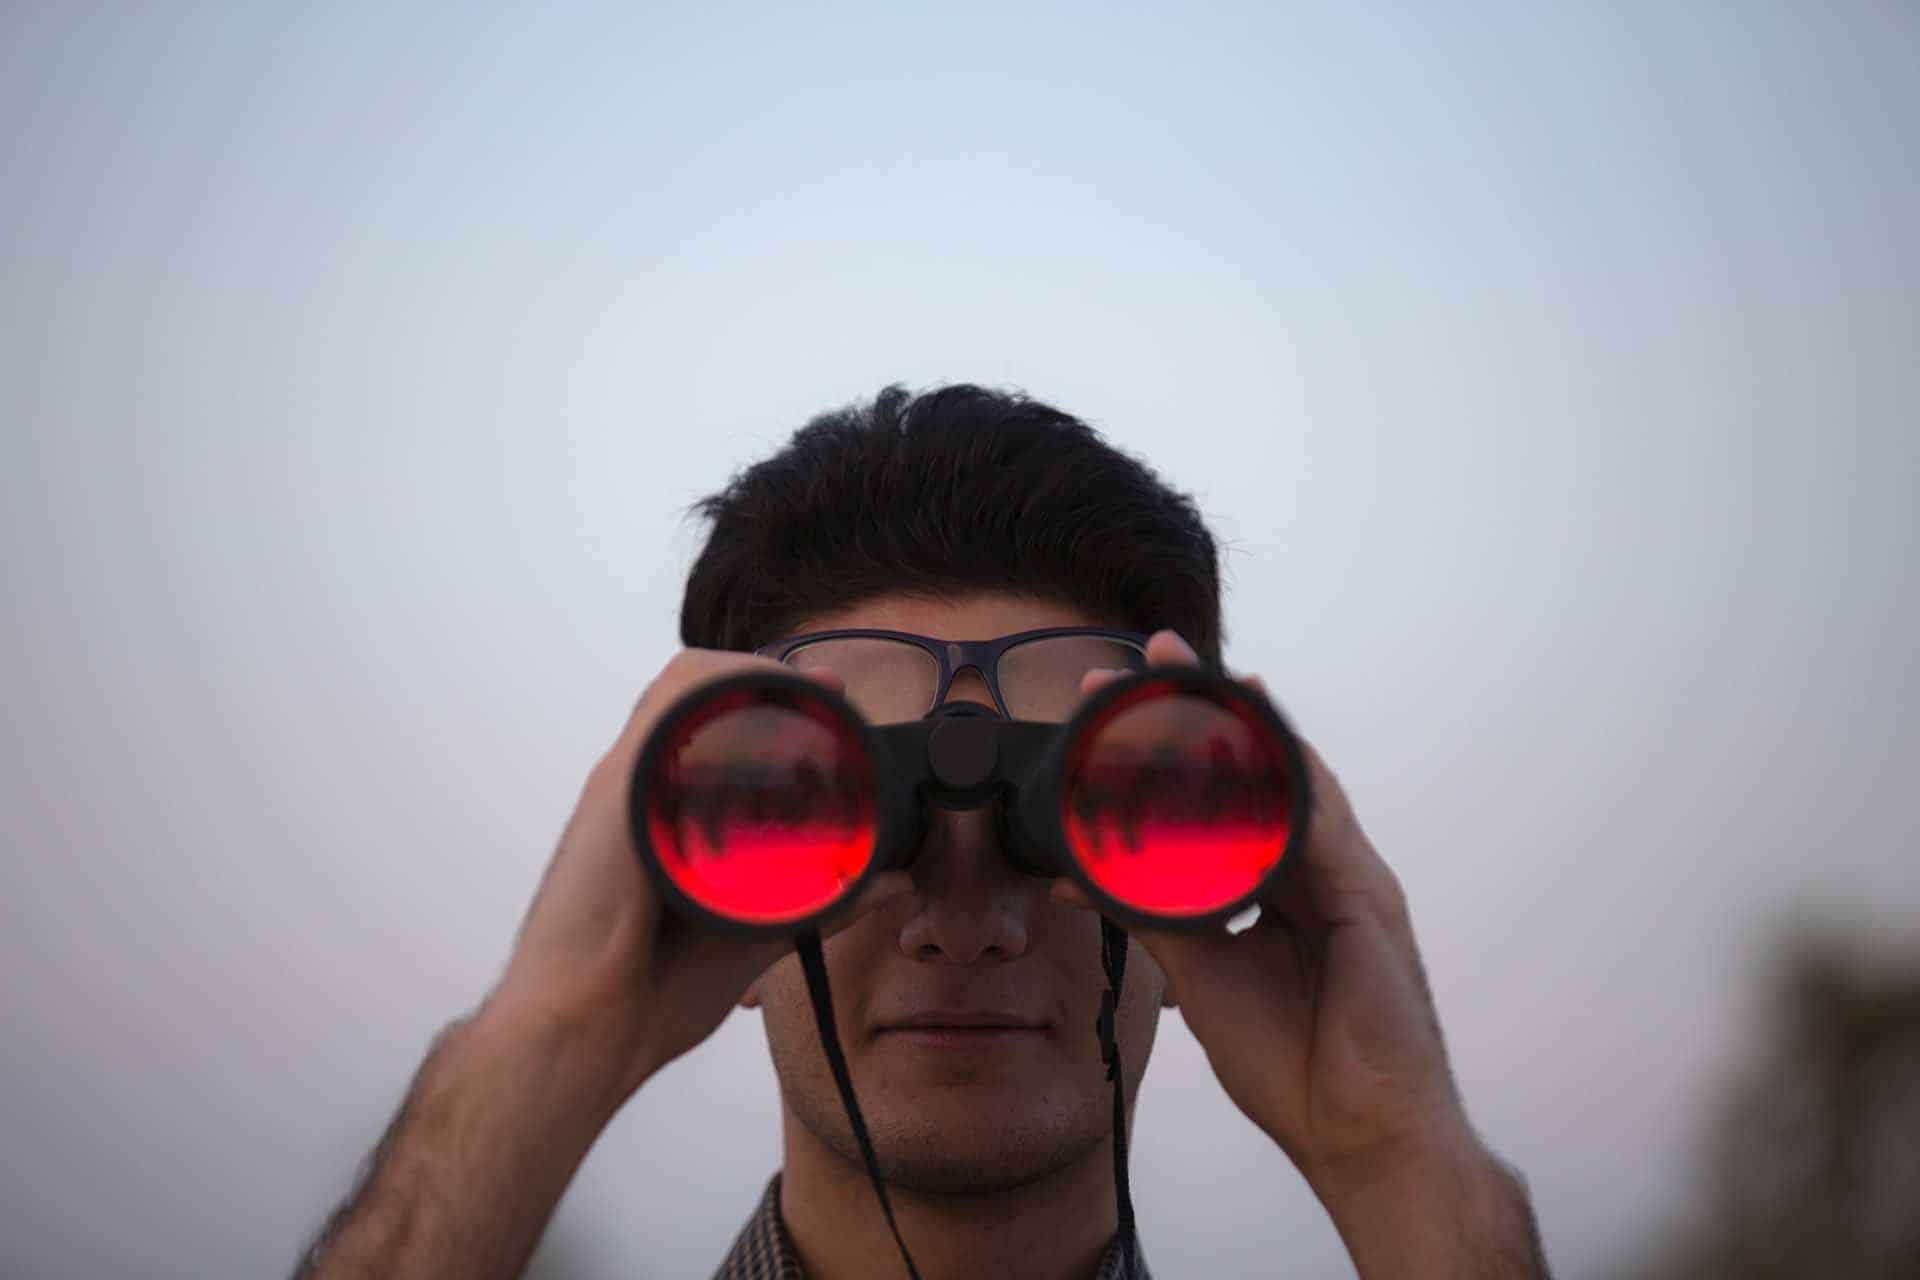 t2informatik Blog: Who needs long-term goals?